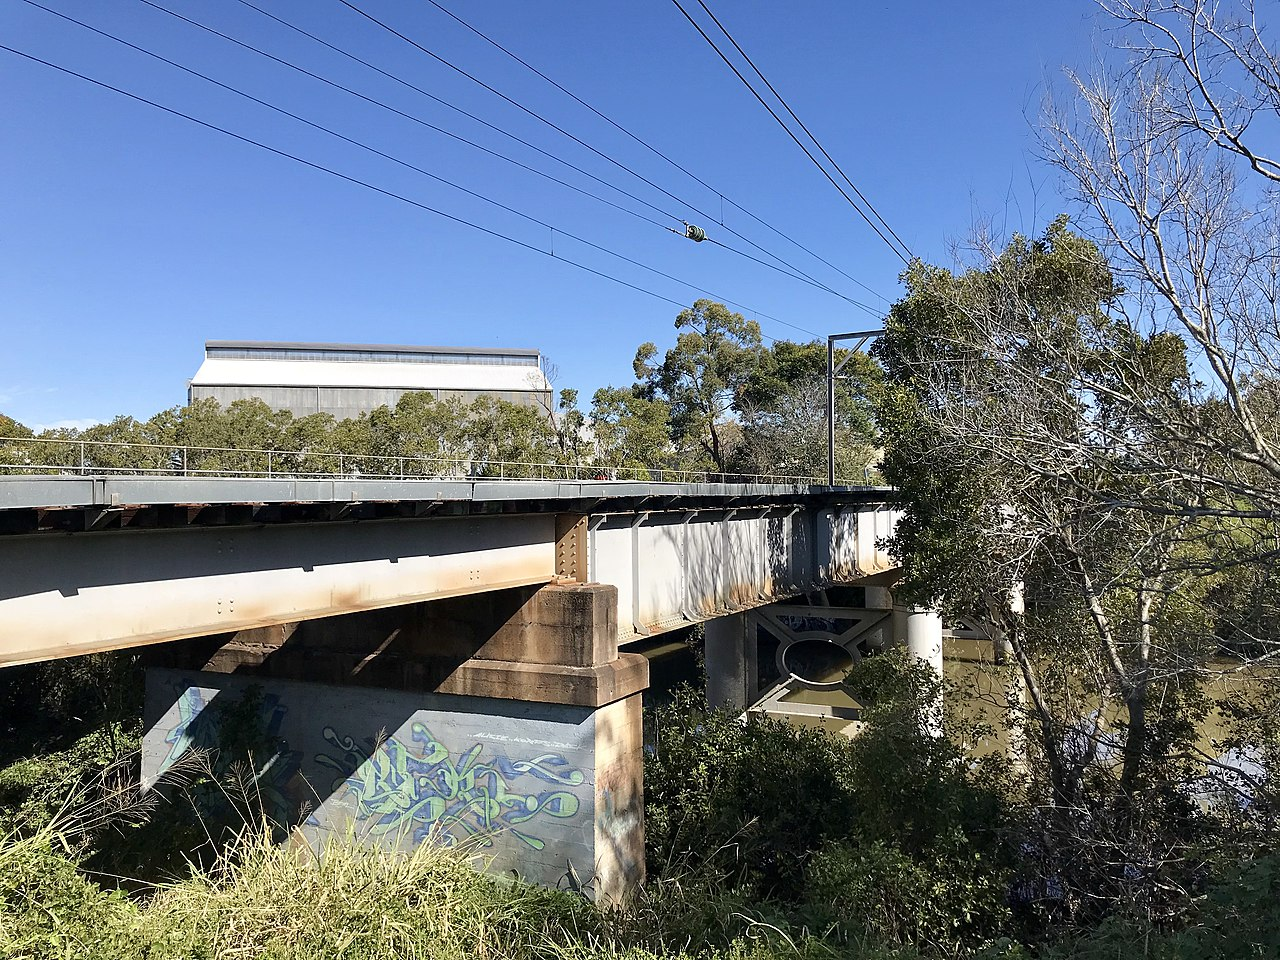 File:Oxley Creek Railway Bridge in Tennyson, Queensland ...